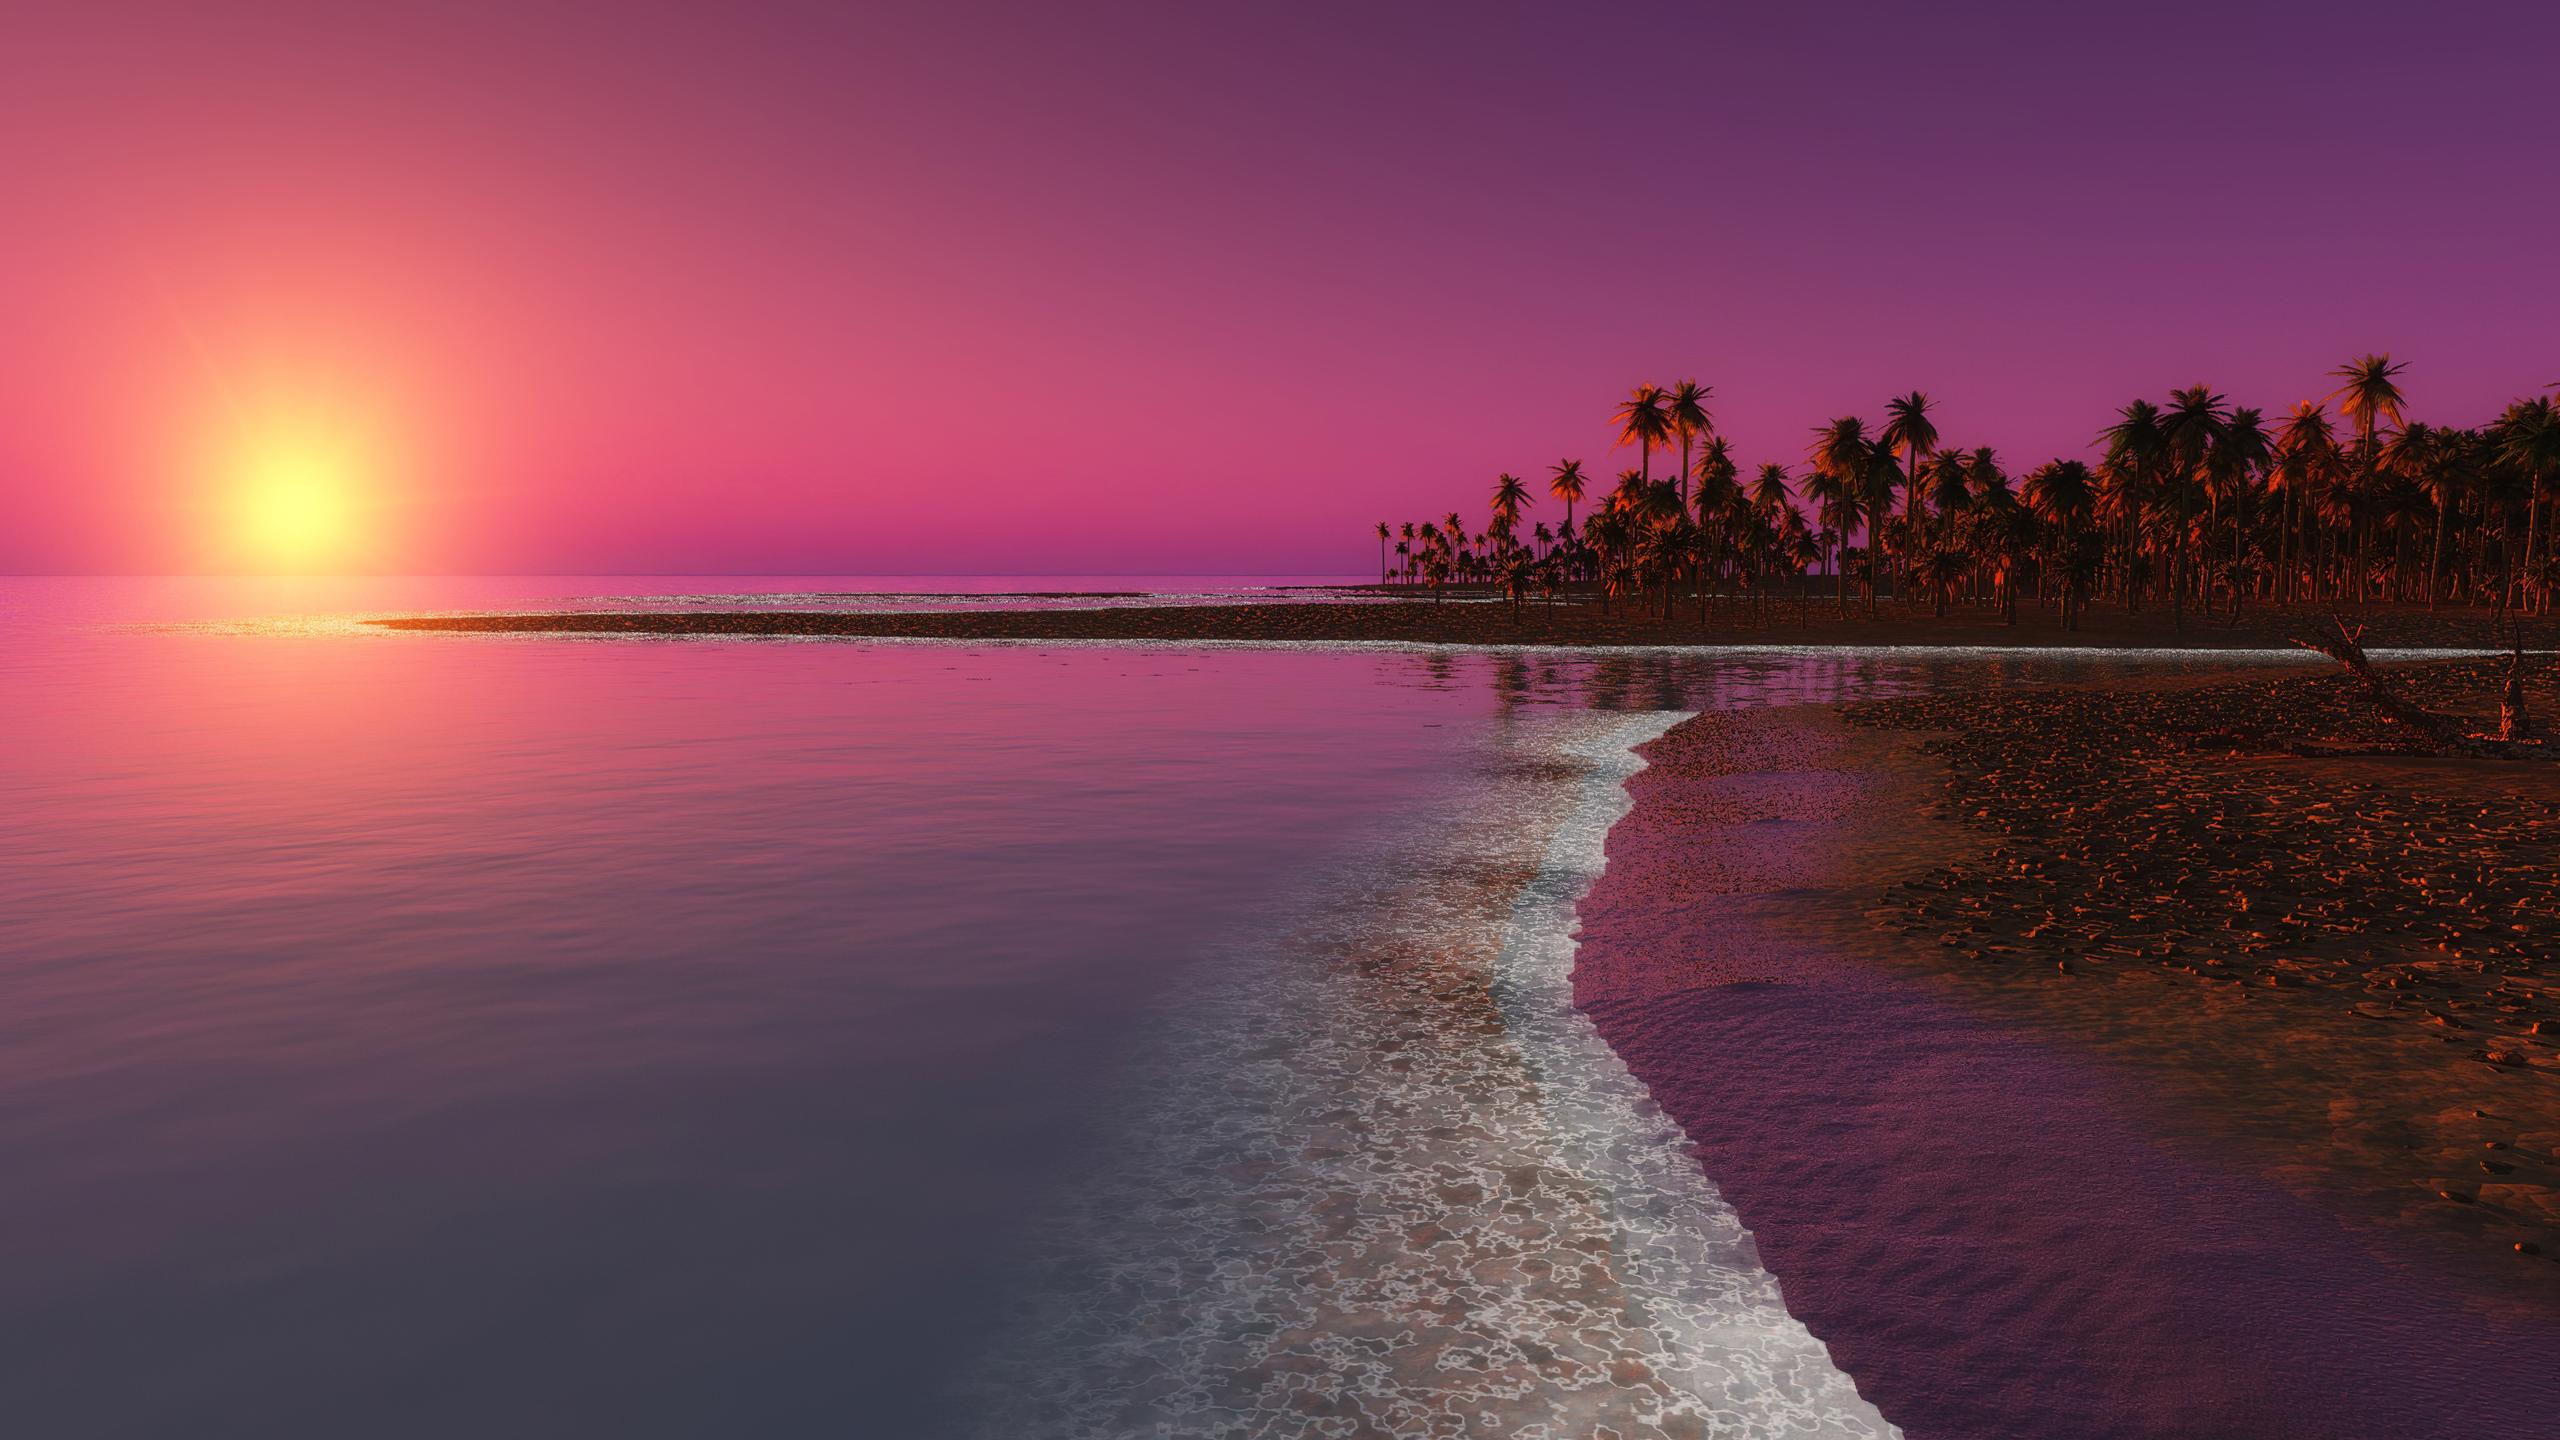 palm-trees-sunset-digital-nature-4k-ho.jpg